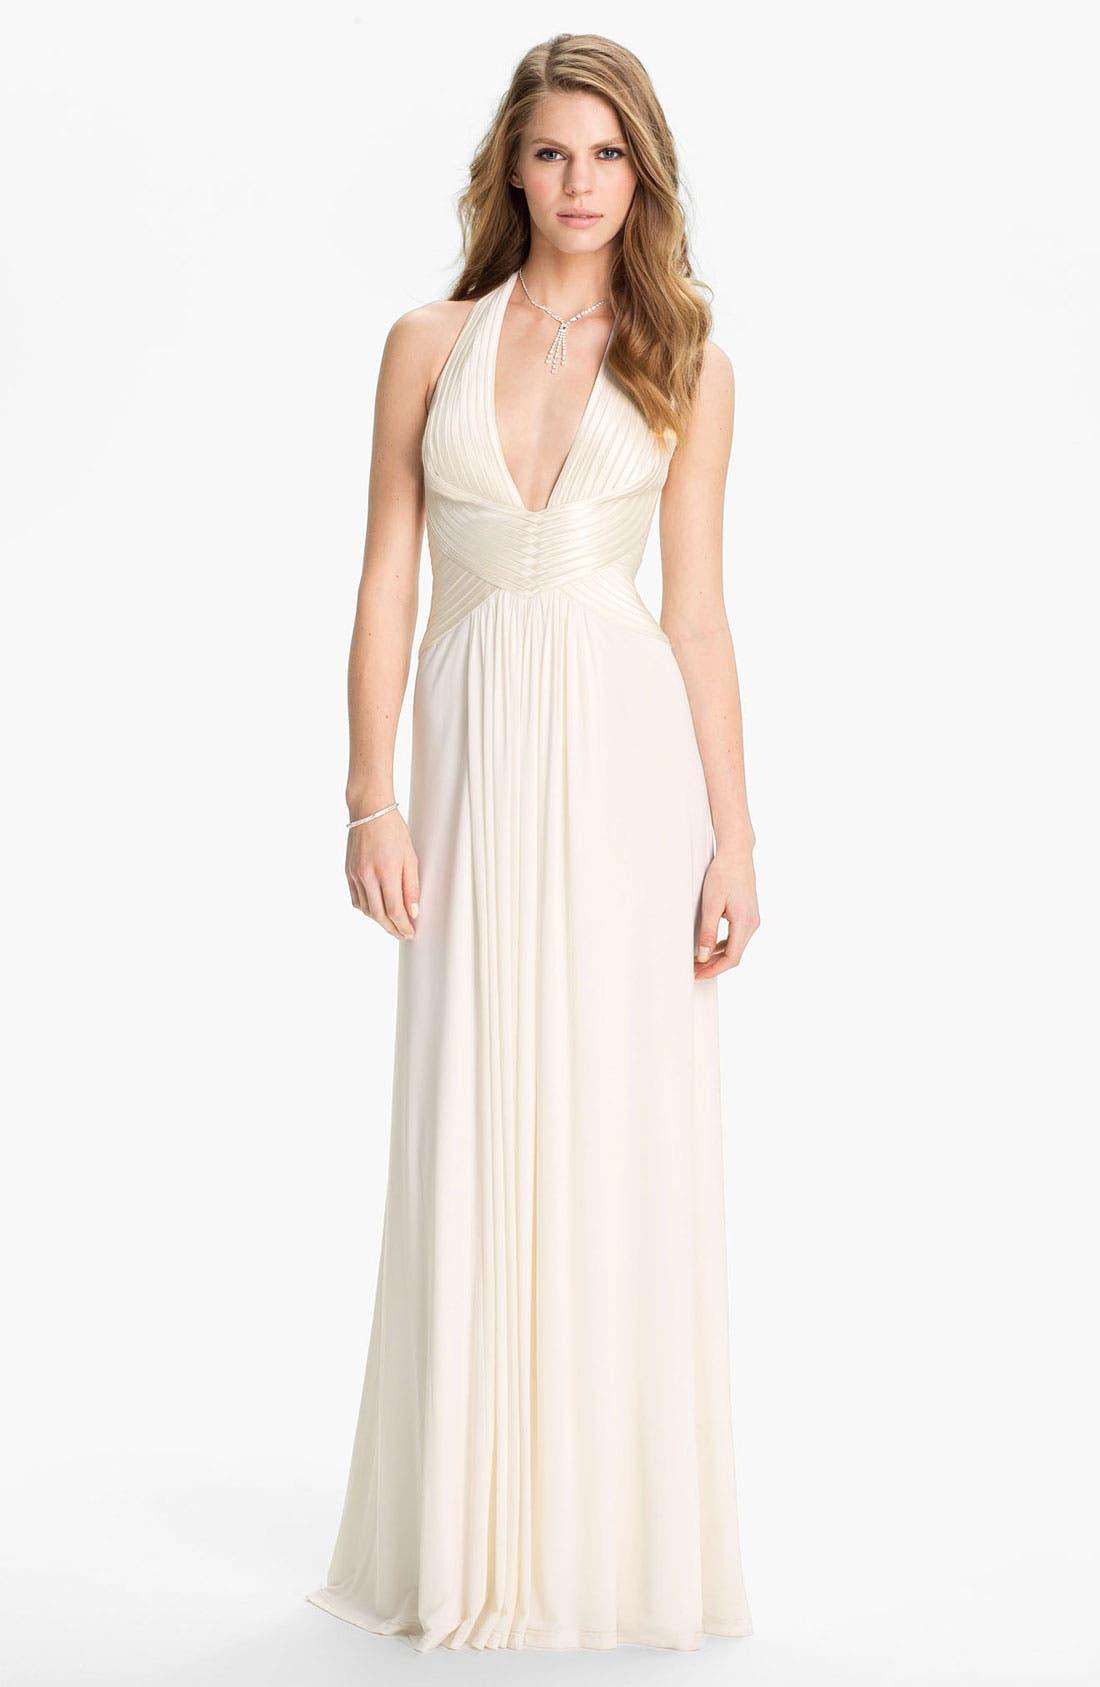 Main Image - BCBGMAXAZRIA 'Anitra' Satin & Jersey Halter Gown